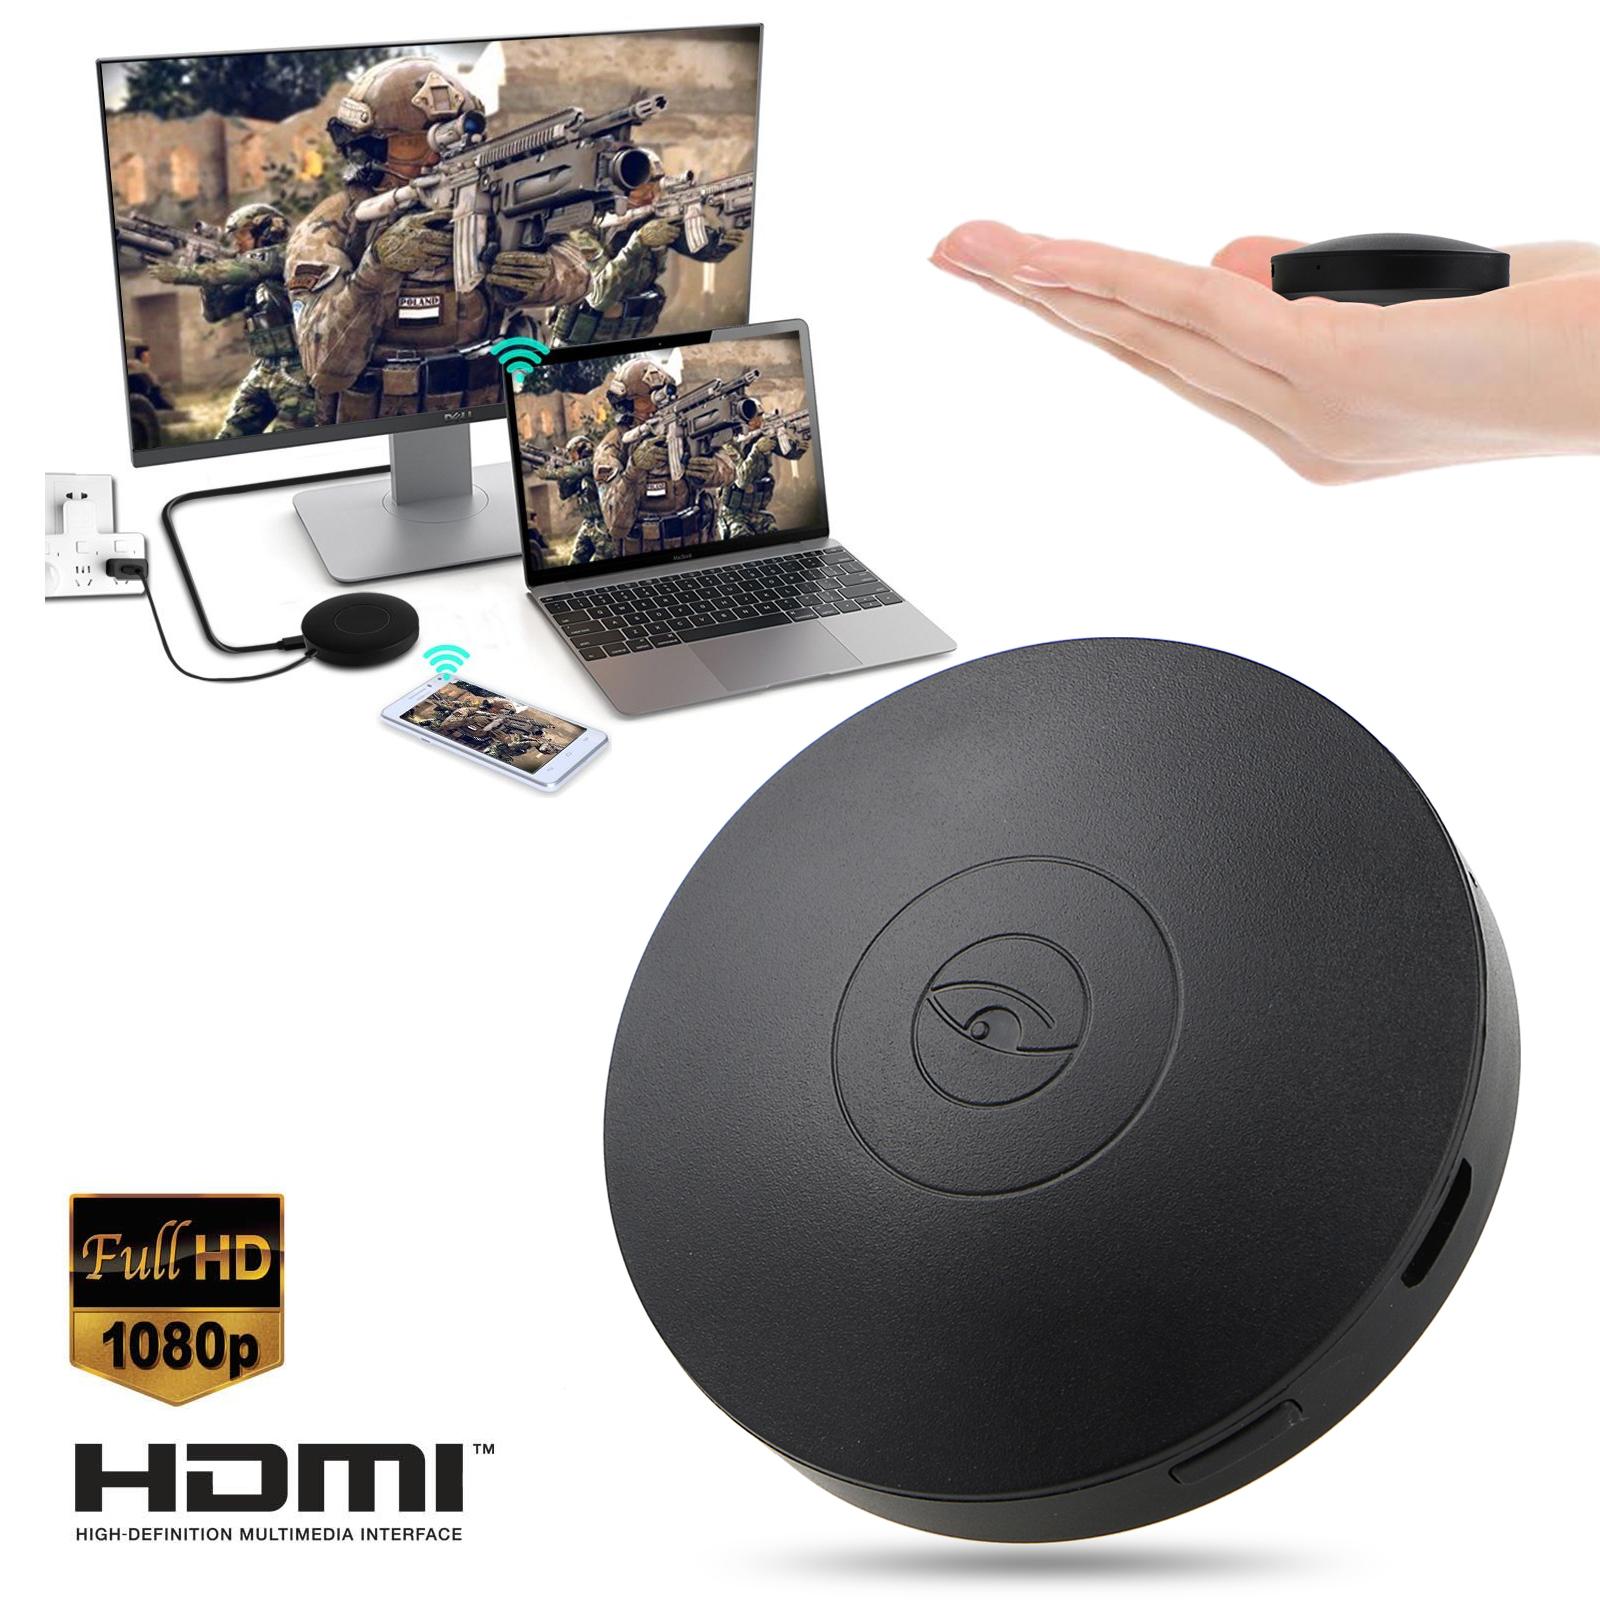 TSV HDMI 1080P Mini WIFI Display Dongle Receiver TV Miracast DLNA AirMirror Airplay for IOS/Android/Windows/Mac